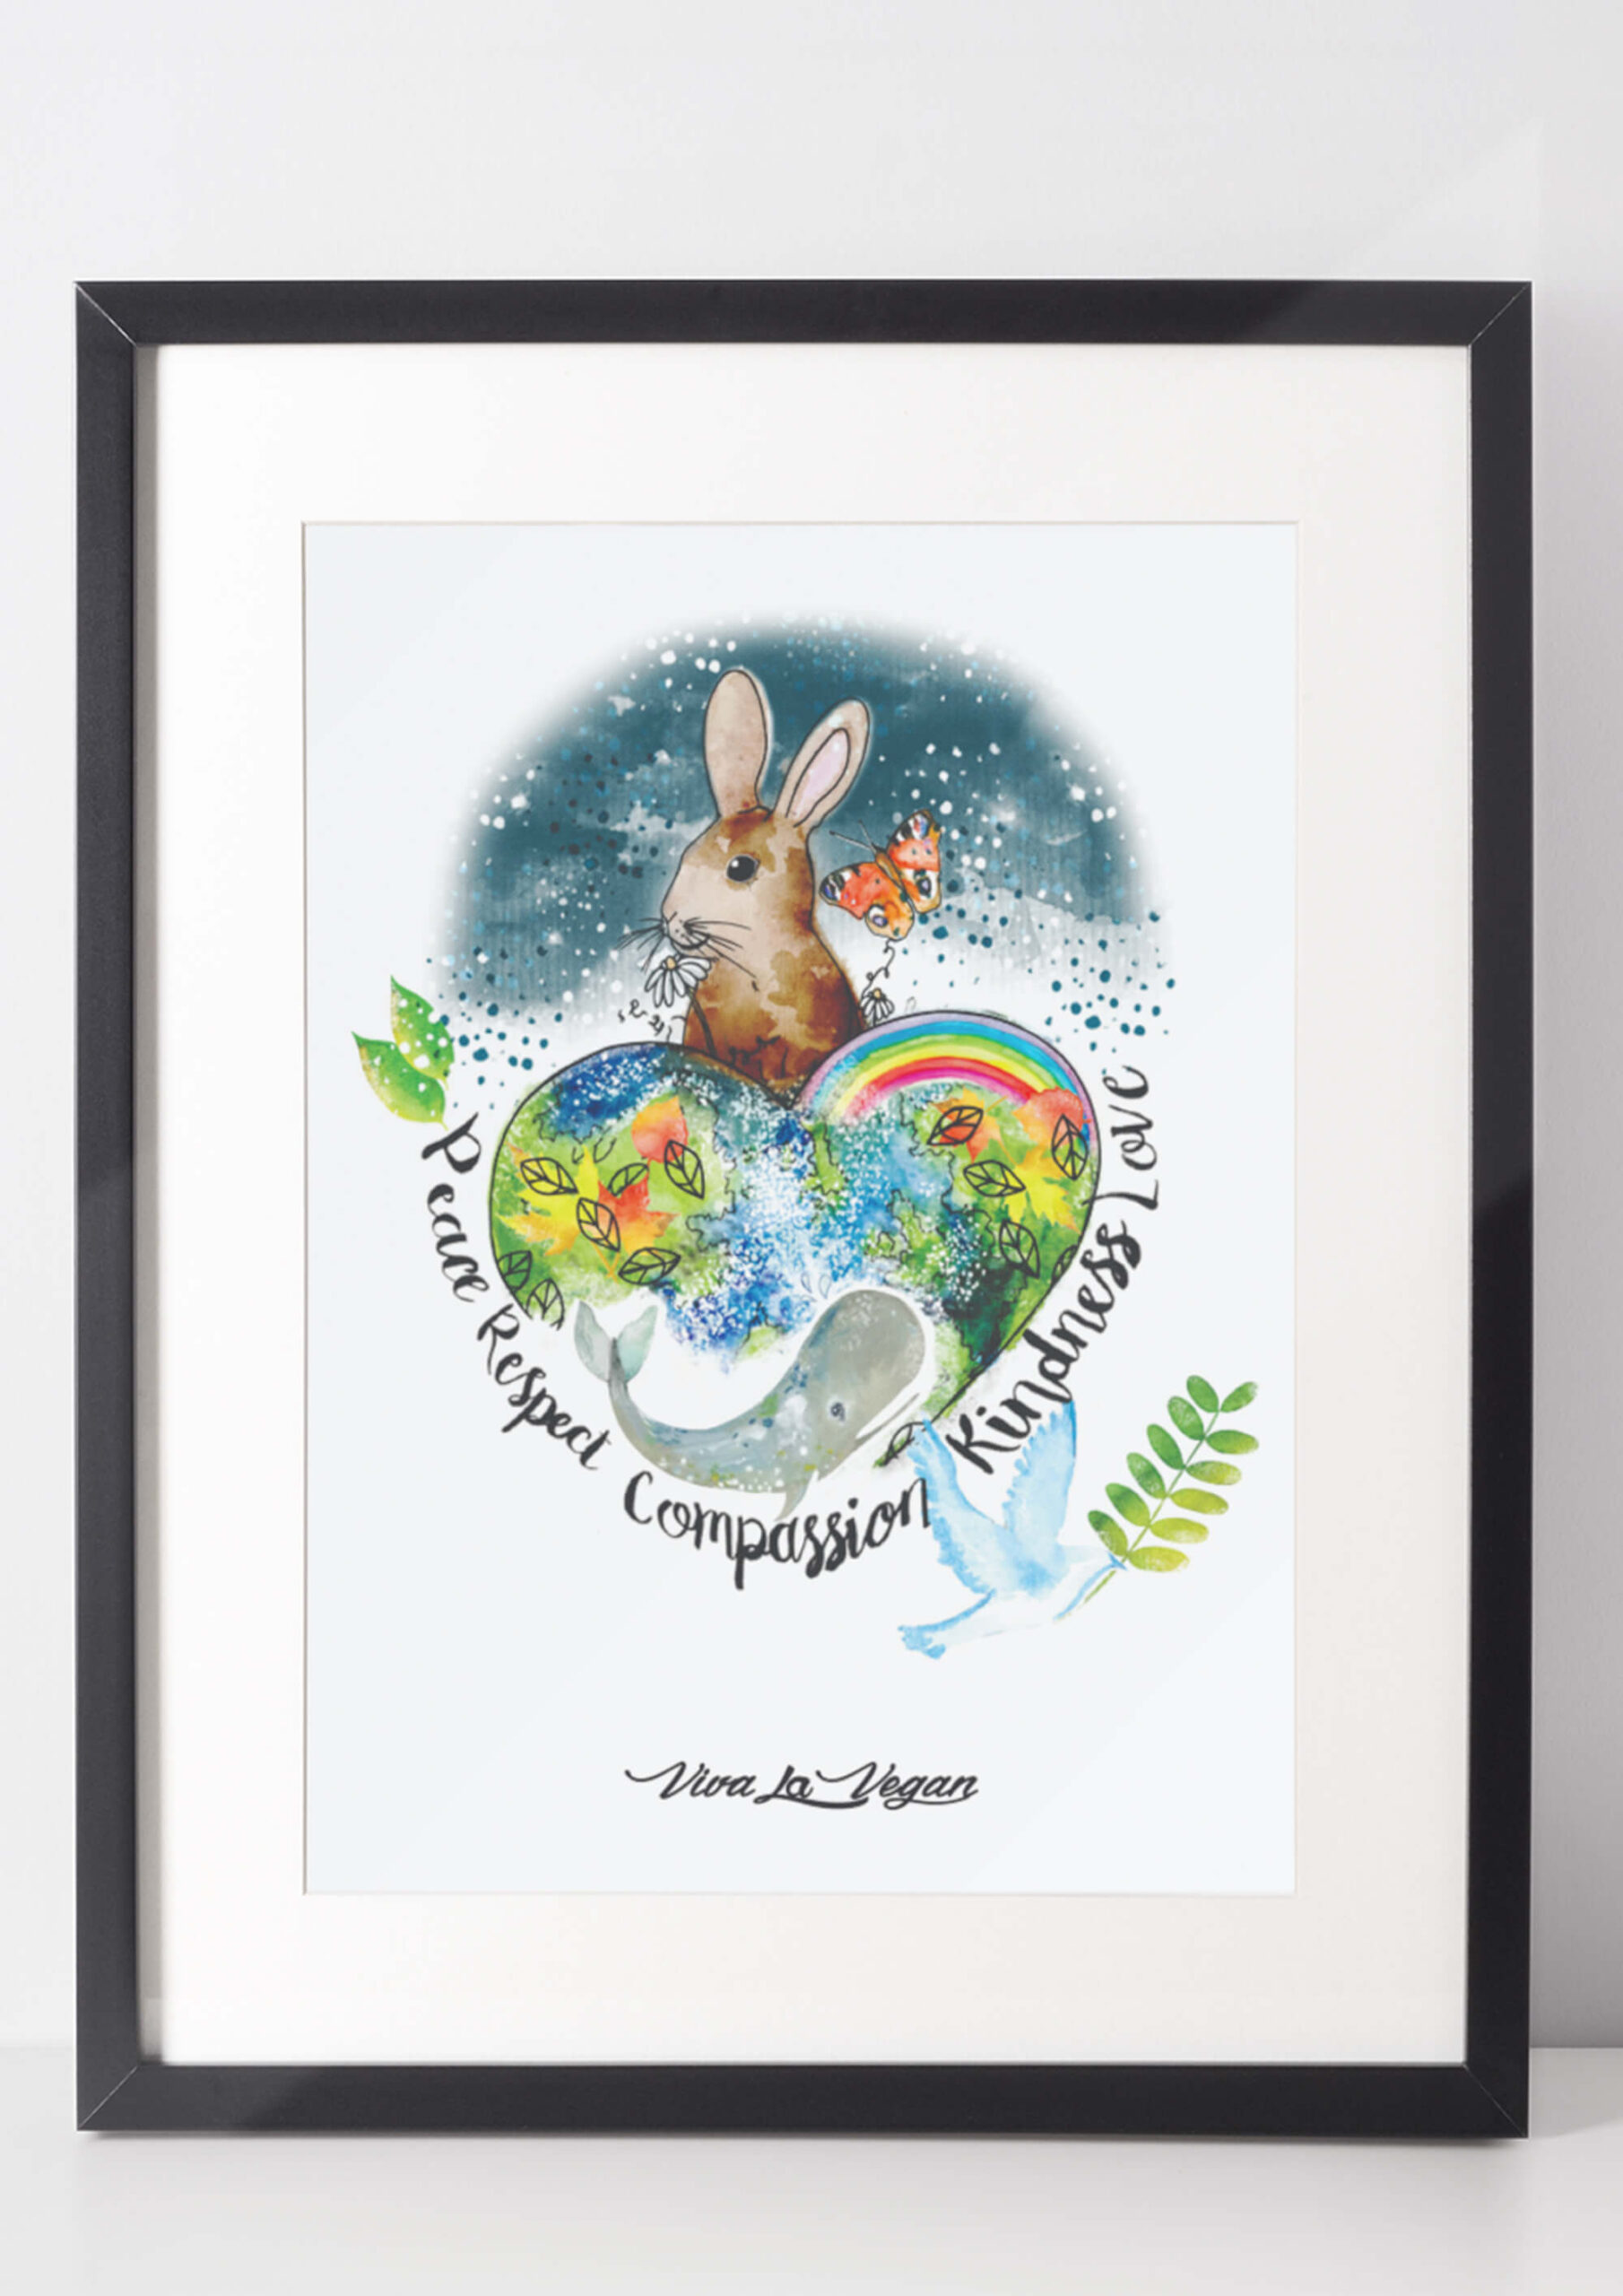 Global Compassion Art Print by eco ethical brand Viva La Vegan